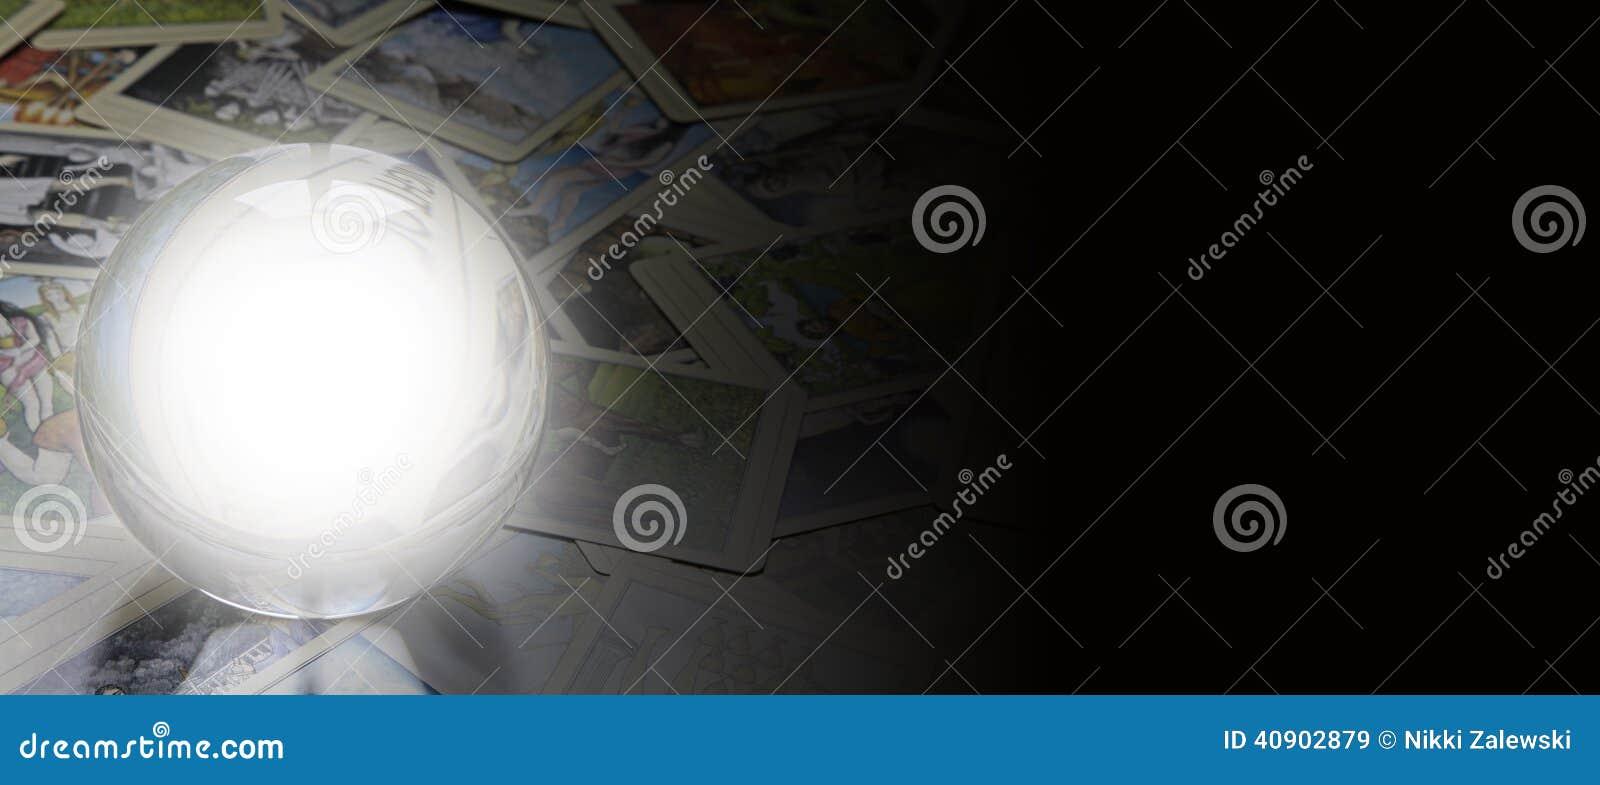 Bandeira do Web site do leitor do tarô